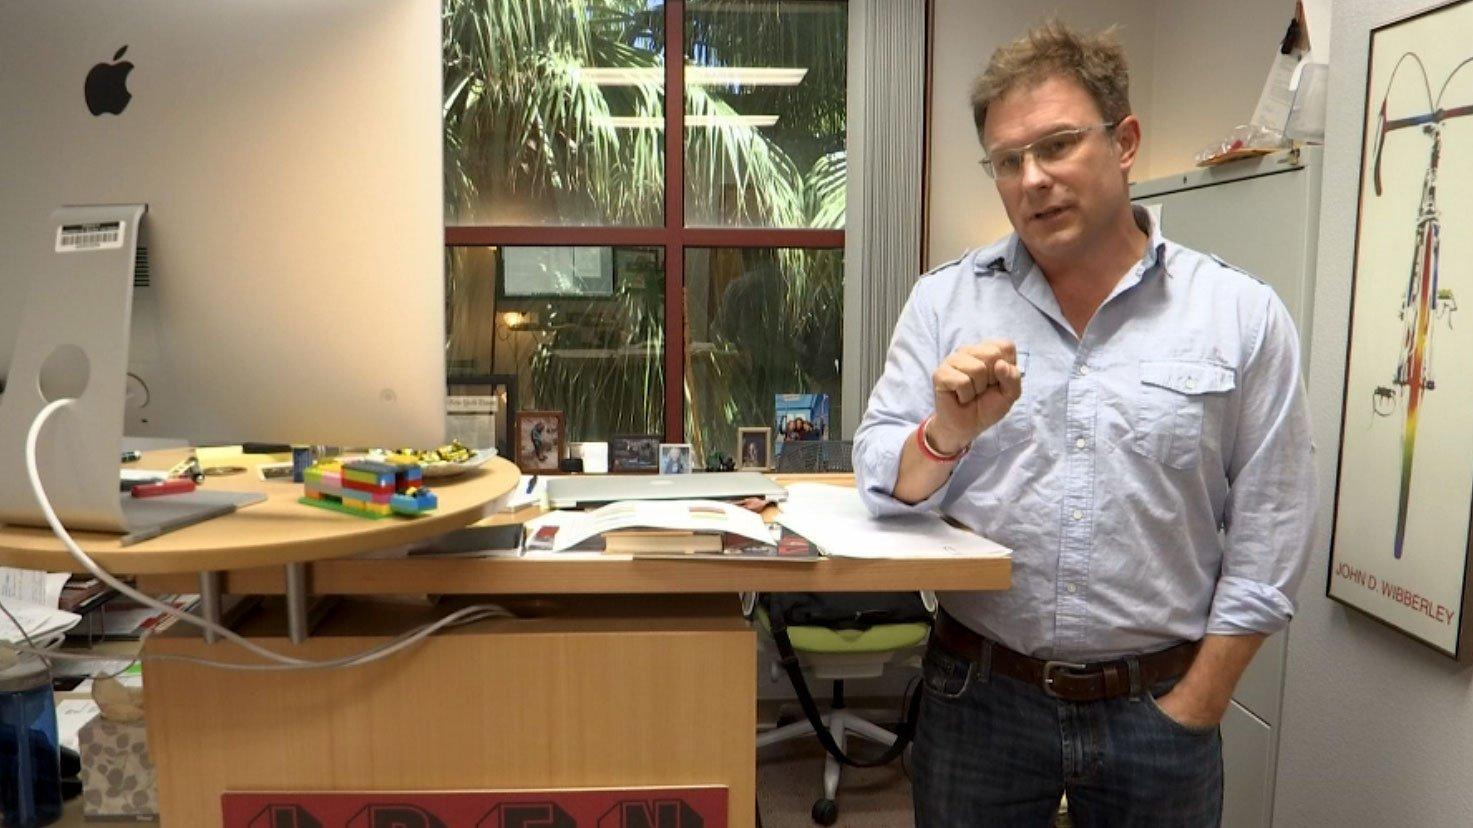 UNLV professor Dr. Robert Futrell during an interview on Aug. 17, 2017. (Cyndi Lundeberg/FOX5)